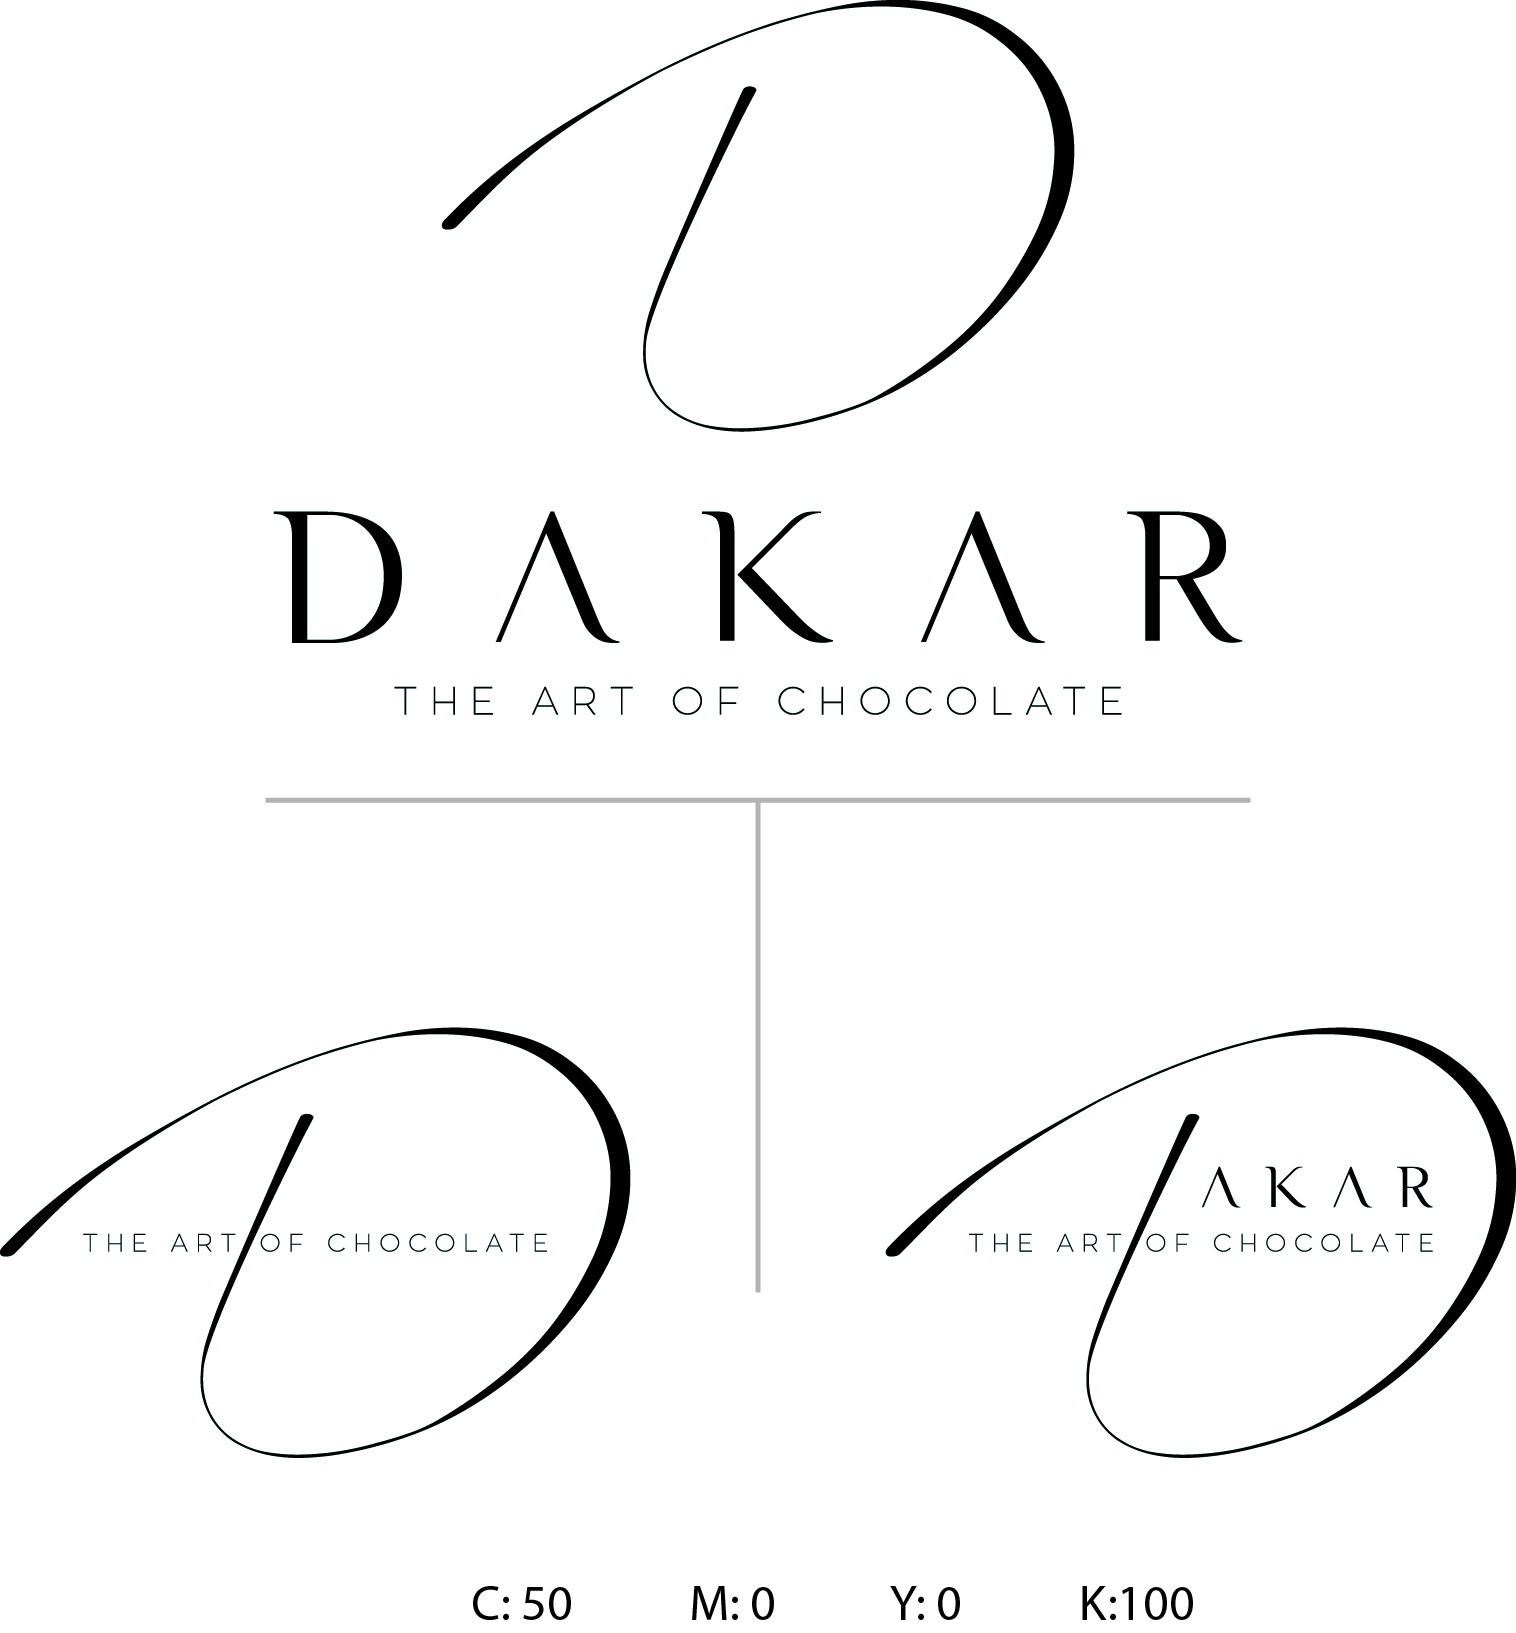 A new and modern chocolate brand logo